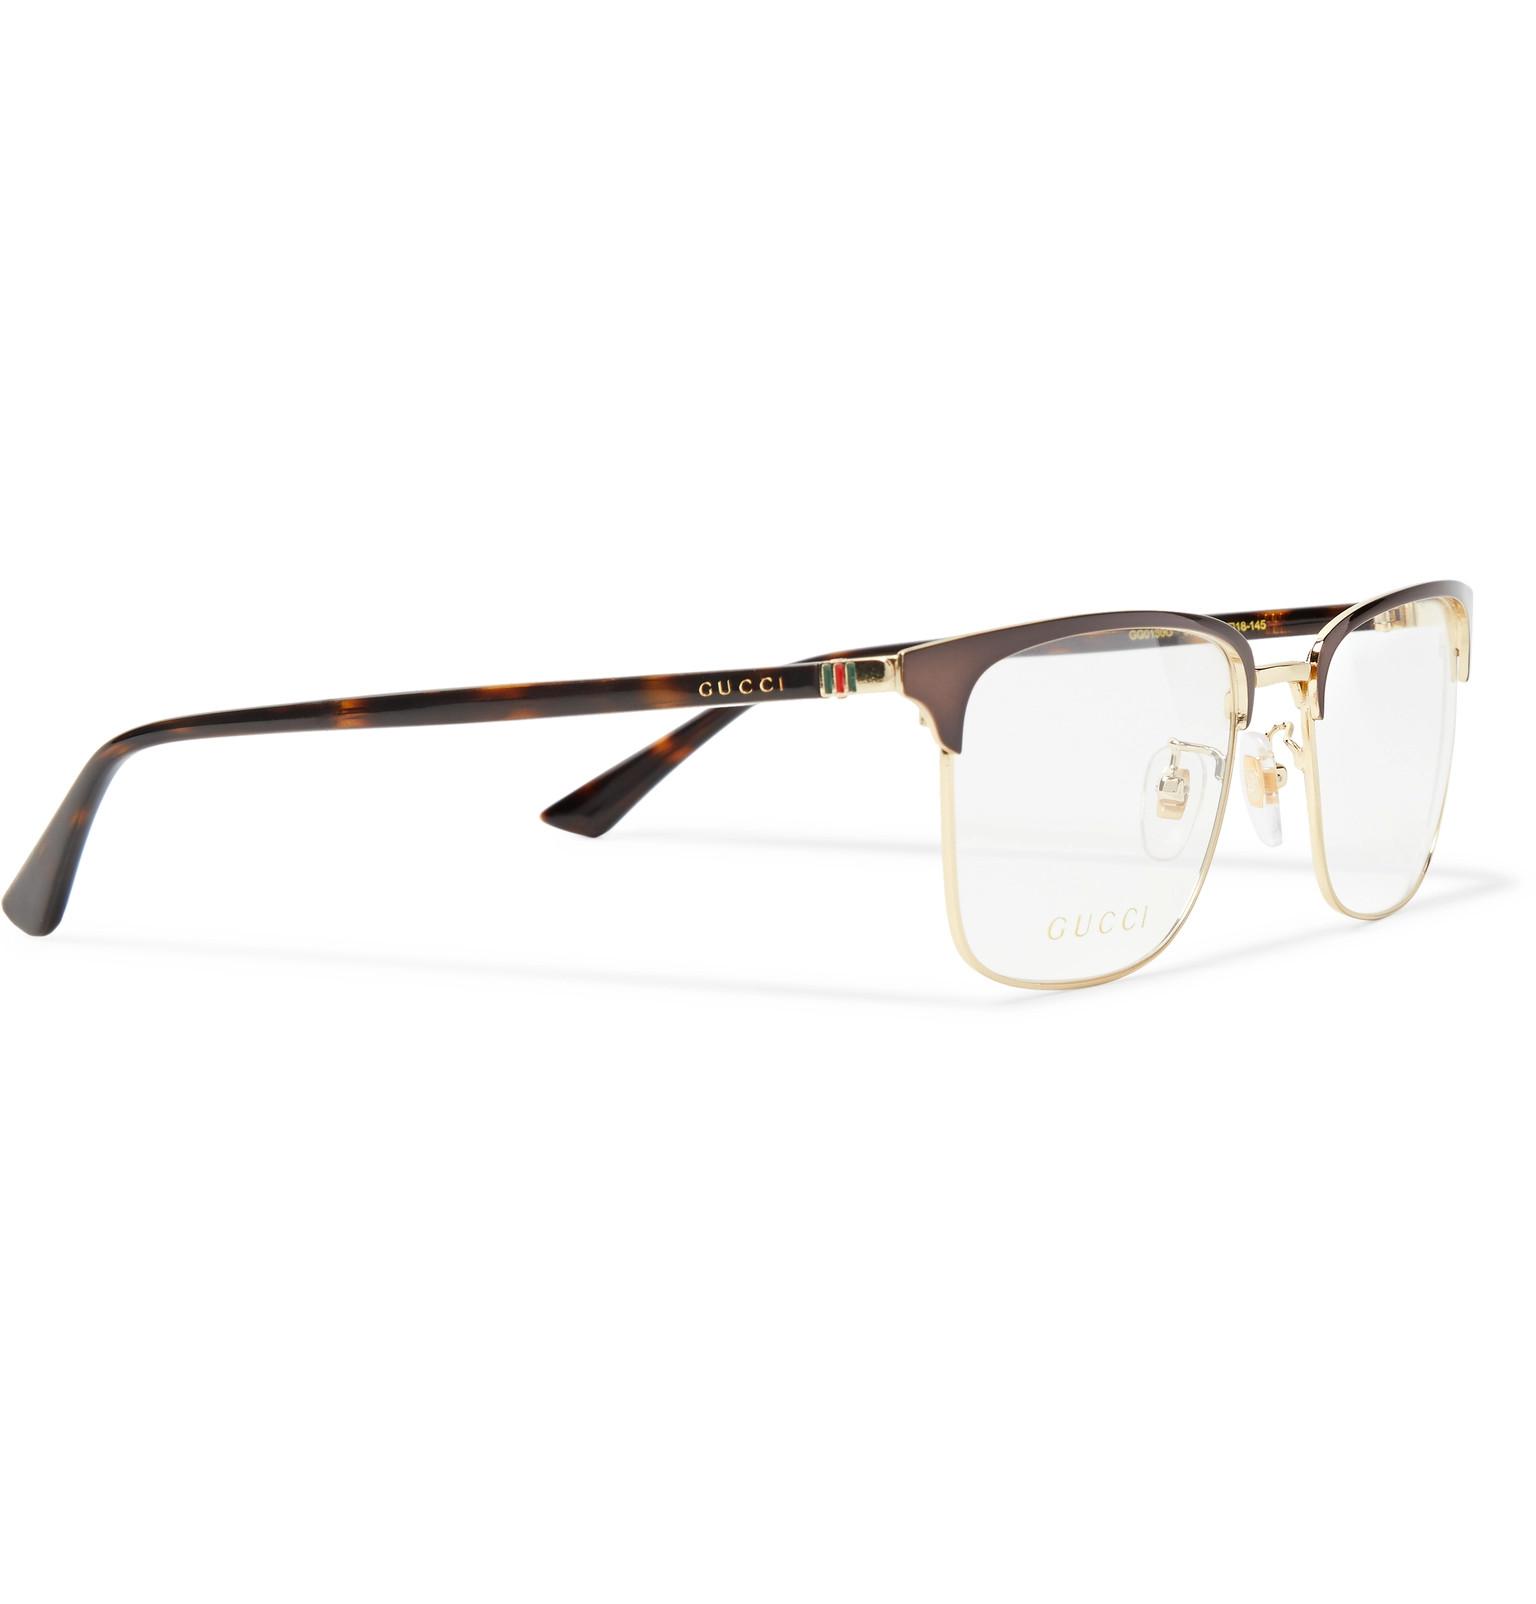 cd644d7d89 Gucci - Square-Frame Tortoiseshell Acetate and Gold-Tone Optical Glasses